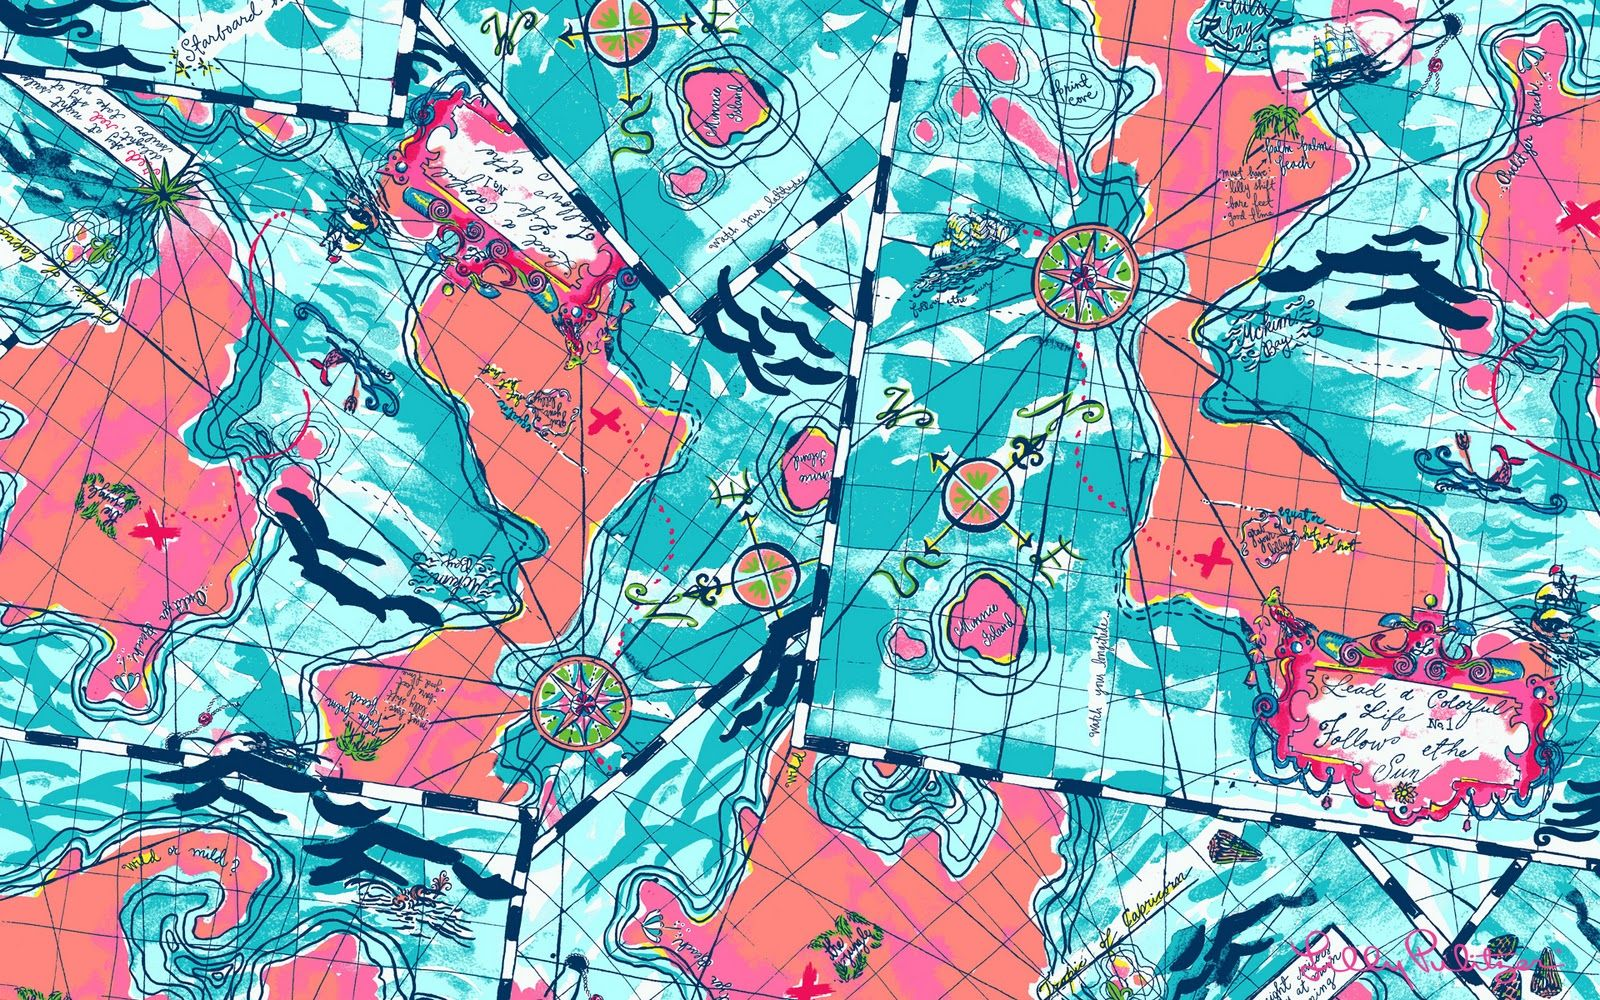 Xmarks 1920x1200 Jpg 1 600 1 000 Pixels Wallpaper Papel De Parede Atriz Imagens Fofas